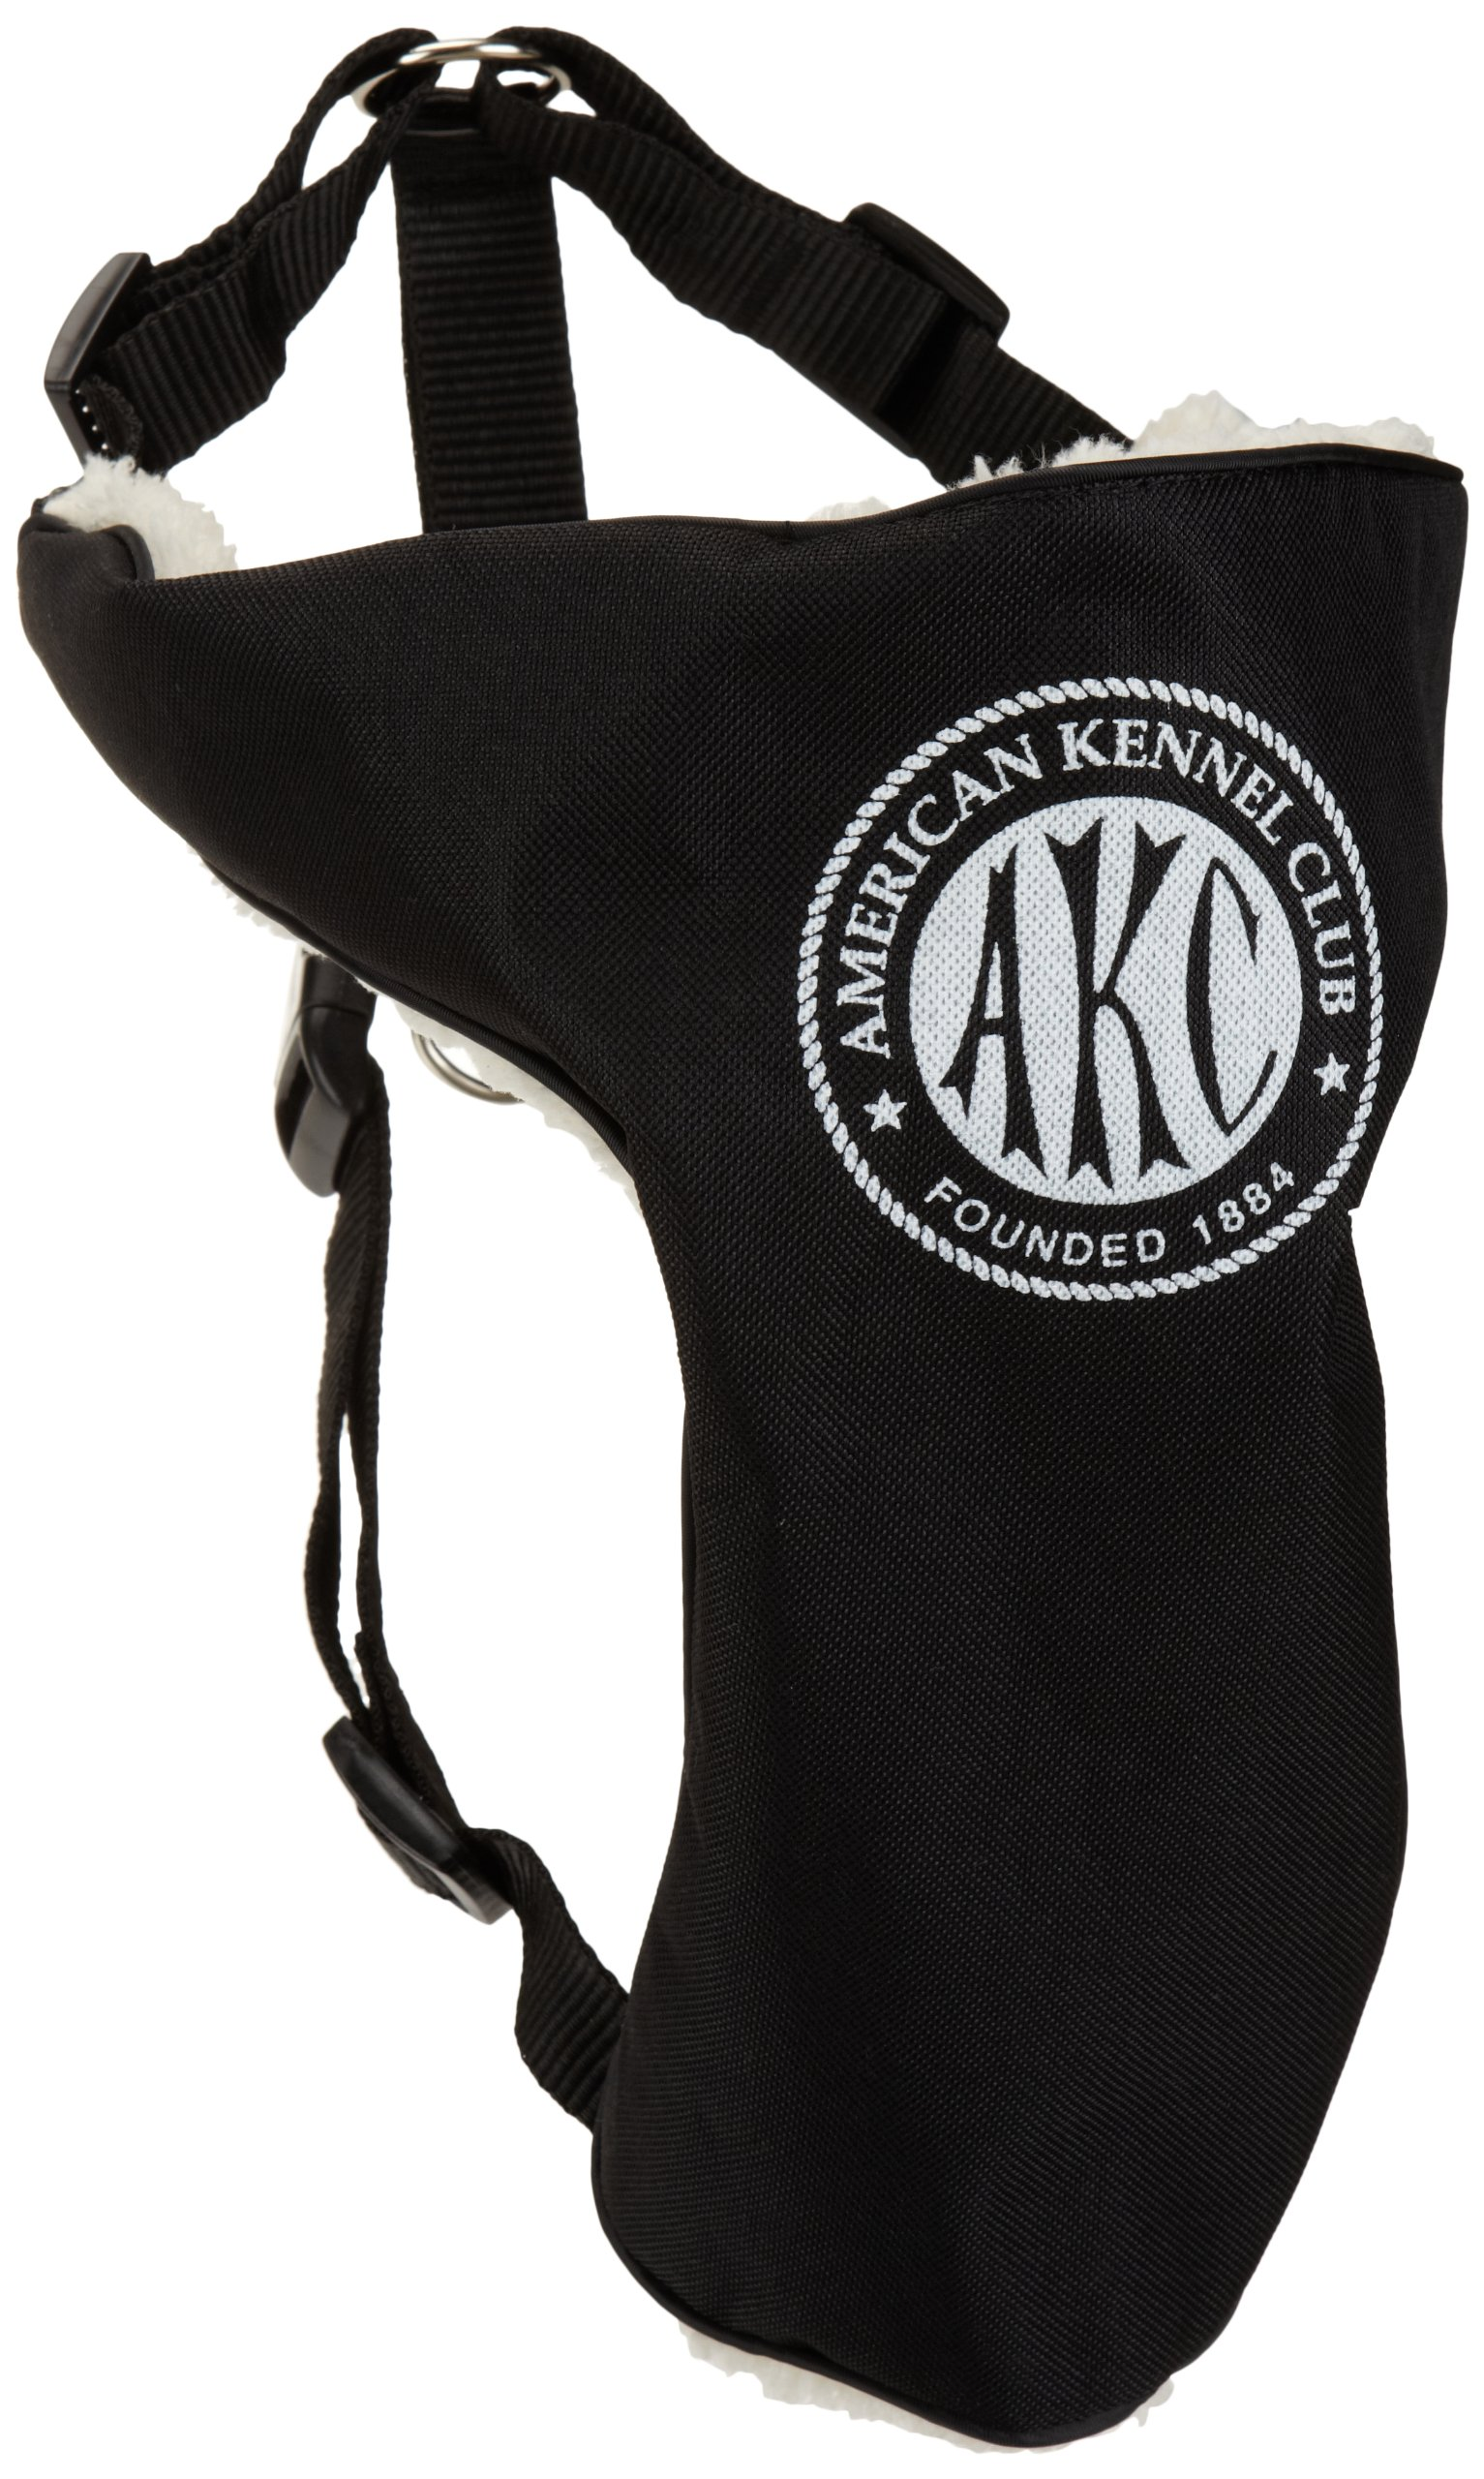 American Kennel Club 2-in-1 Seatbelt Harness, Large